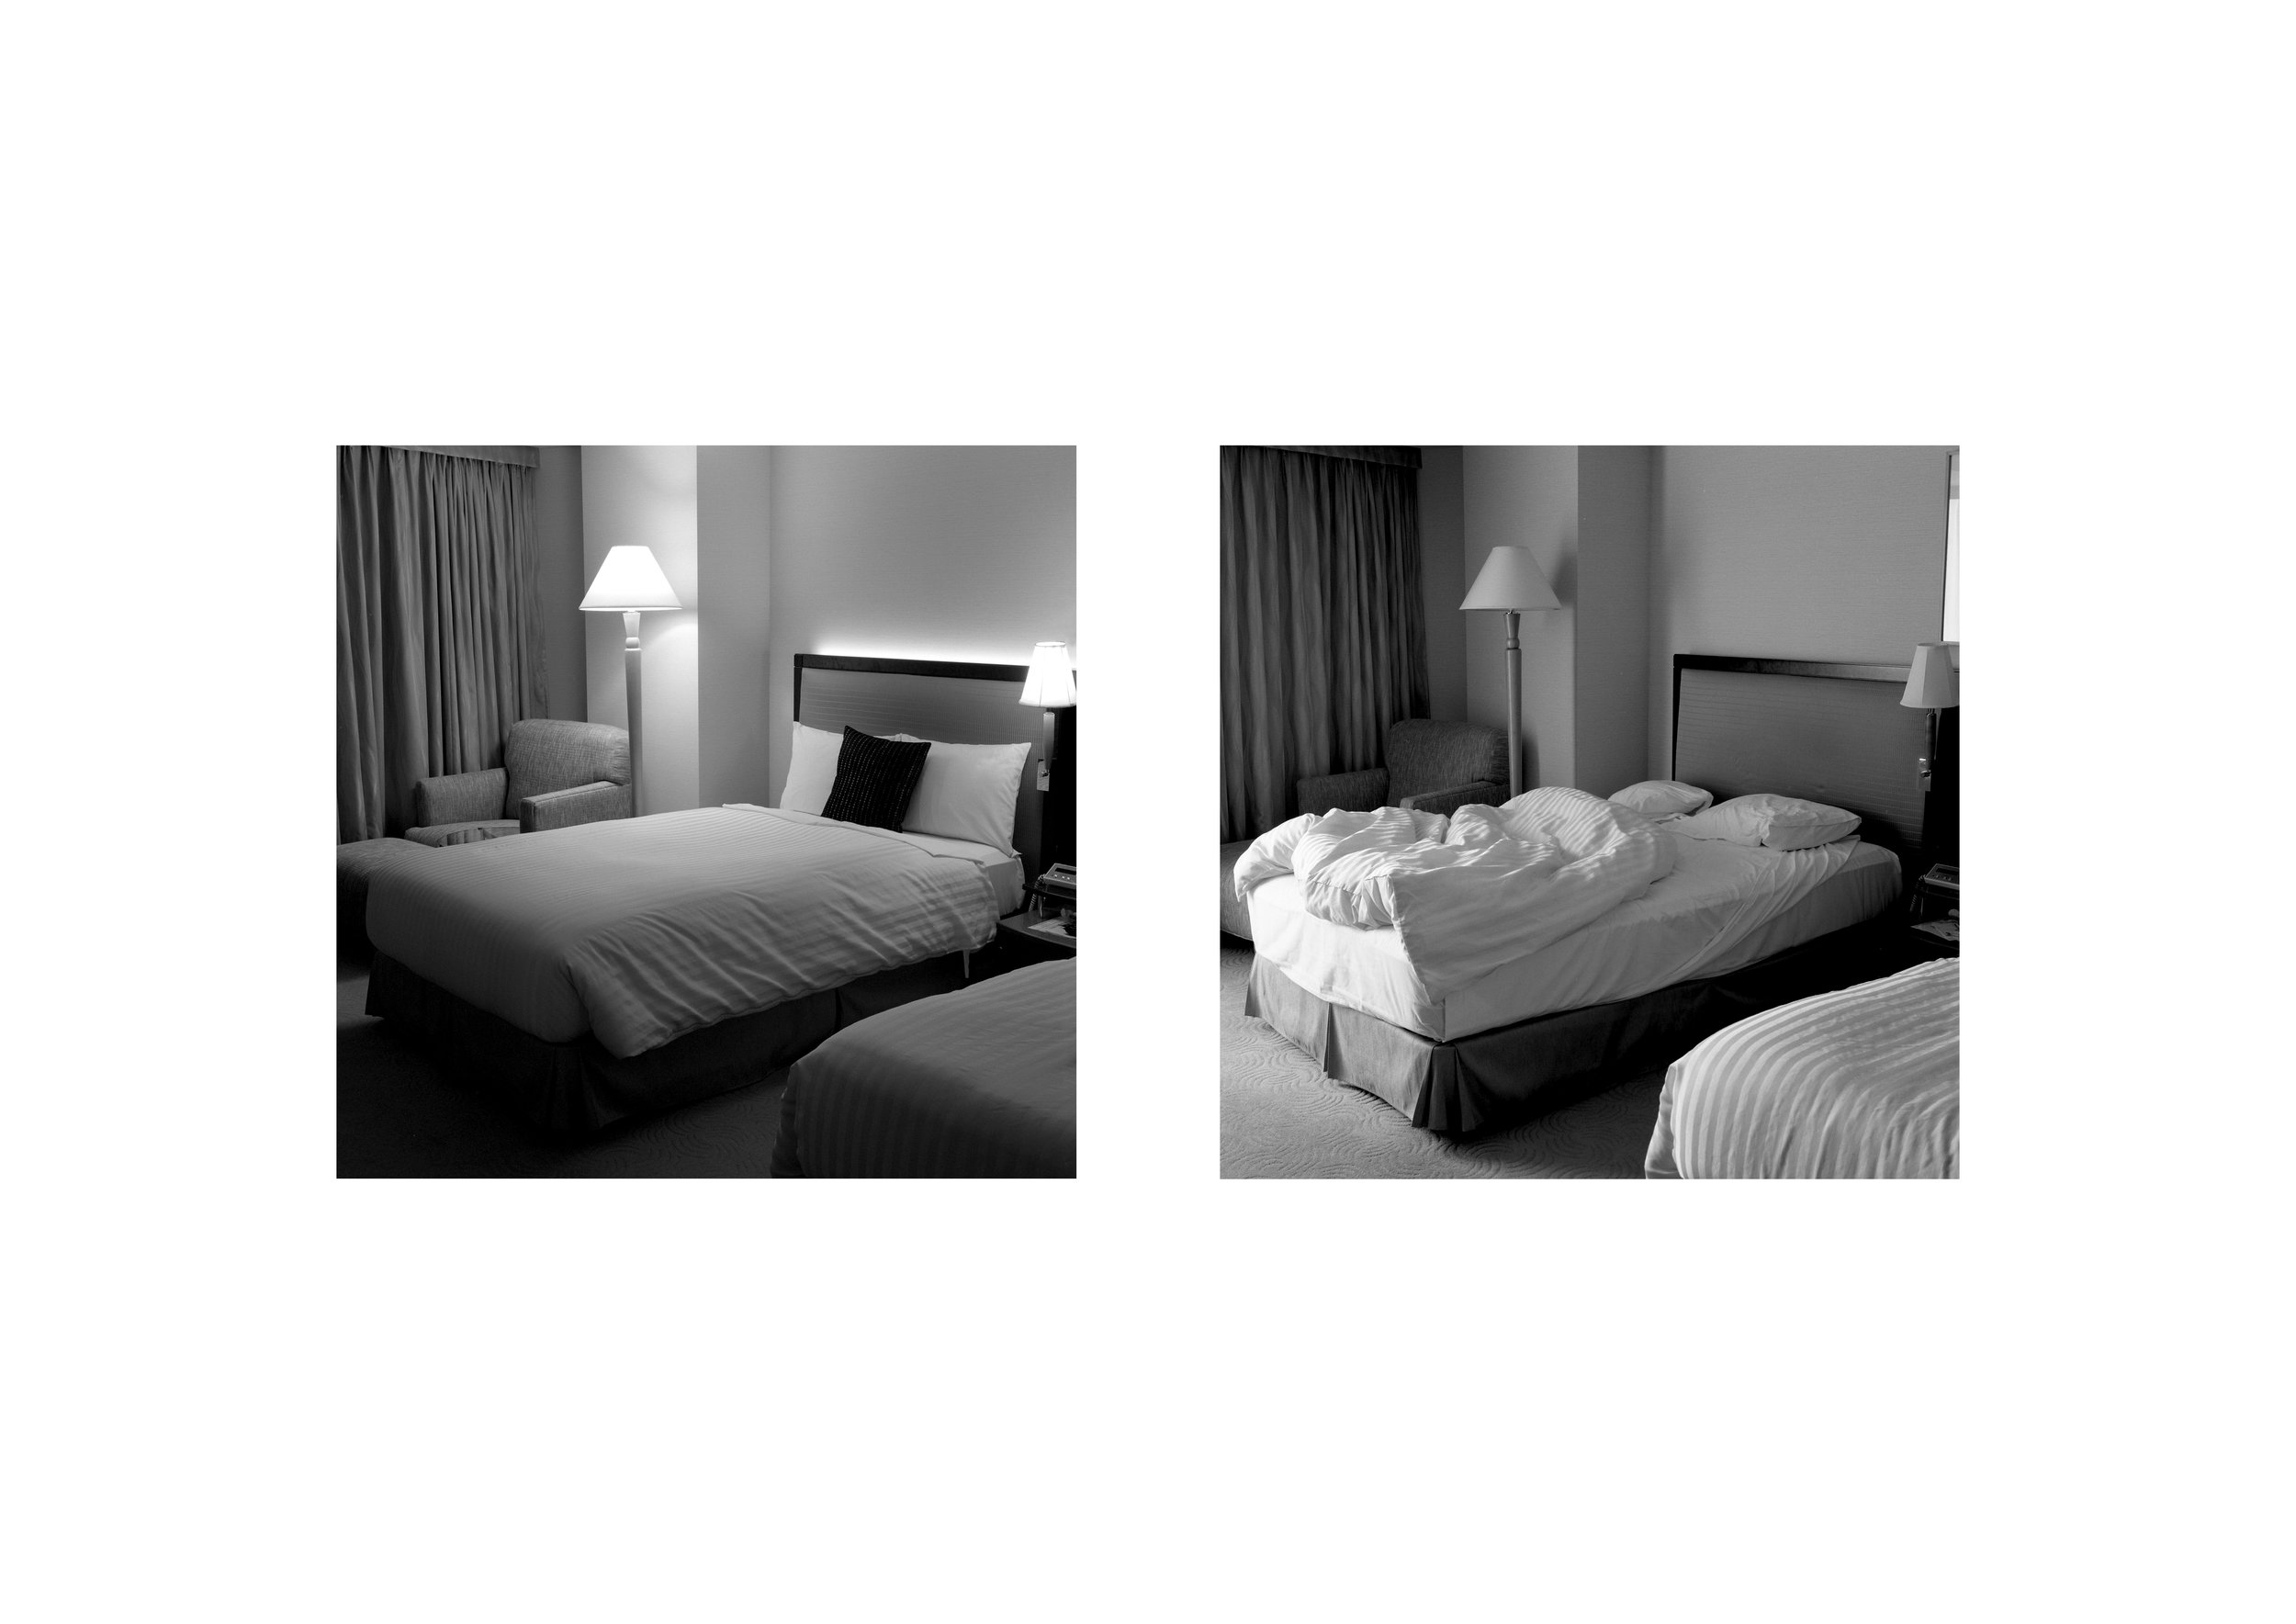 bed-11.jpg